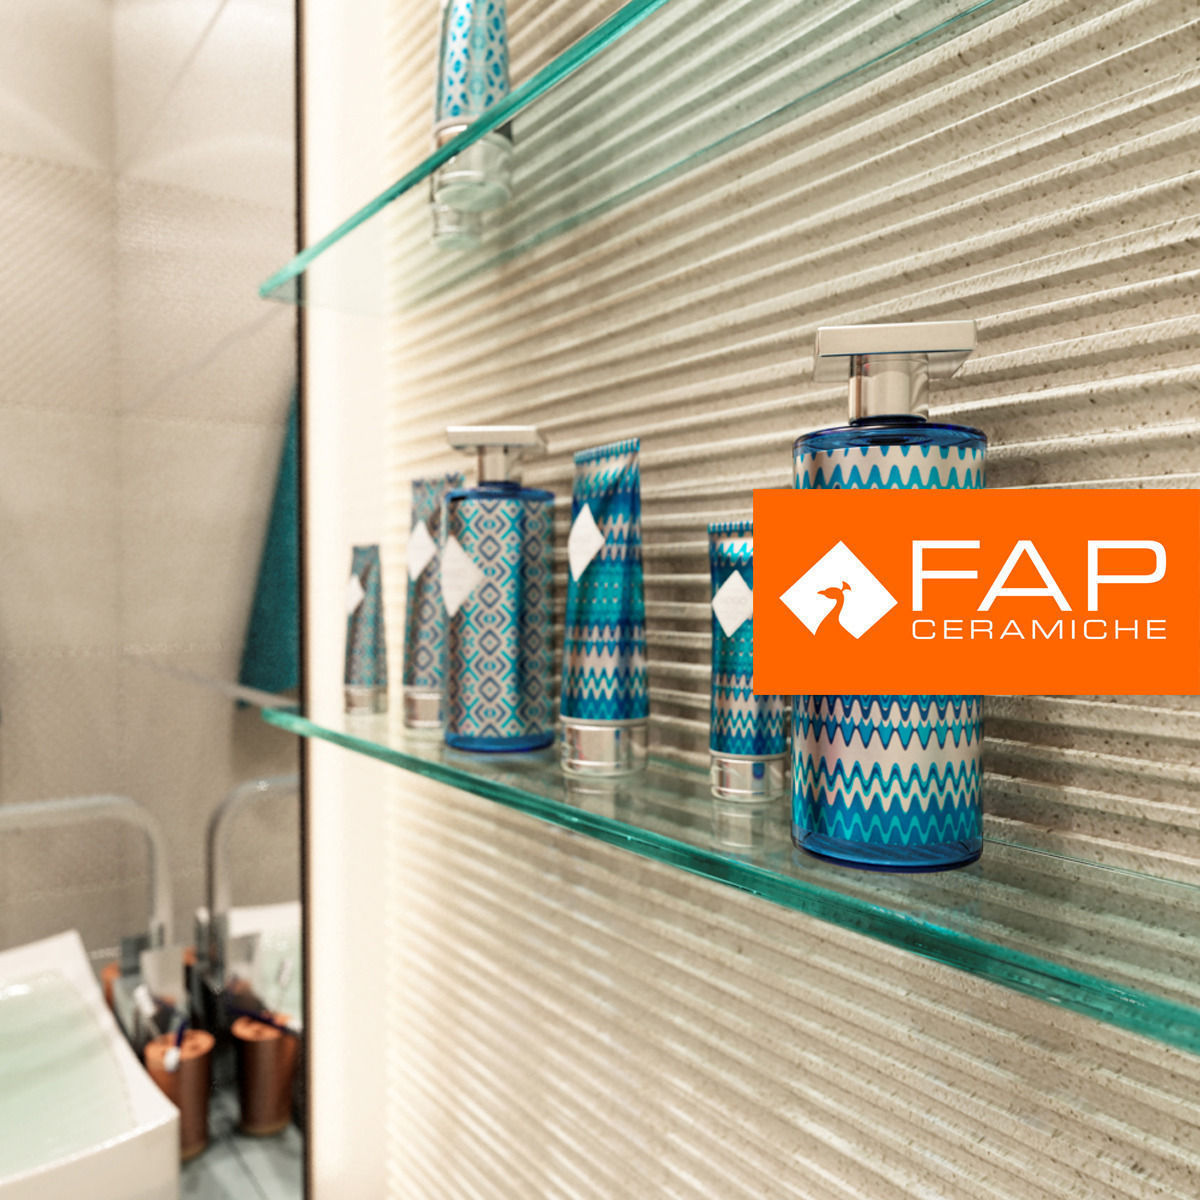 tile fap ceramiche 3d model max. Black Bedroom Furniture Sets. Home Design Ideas